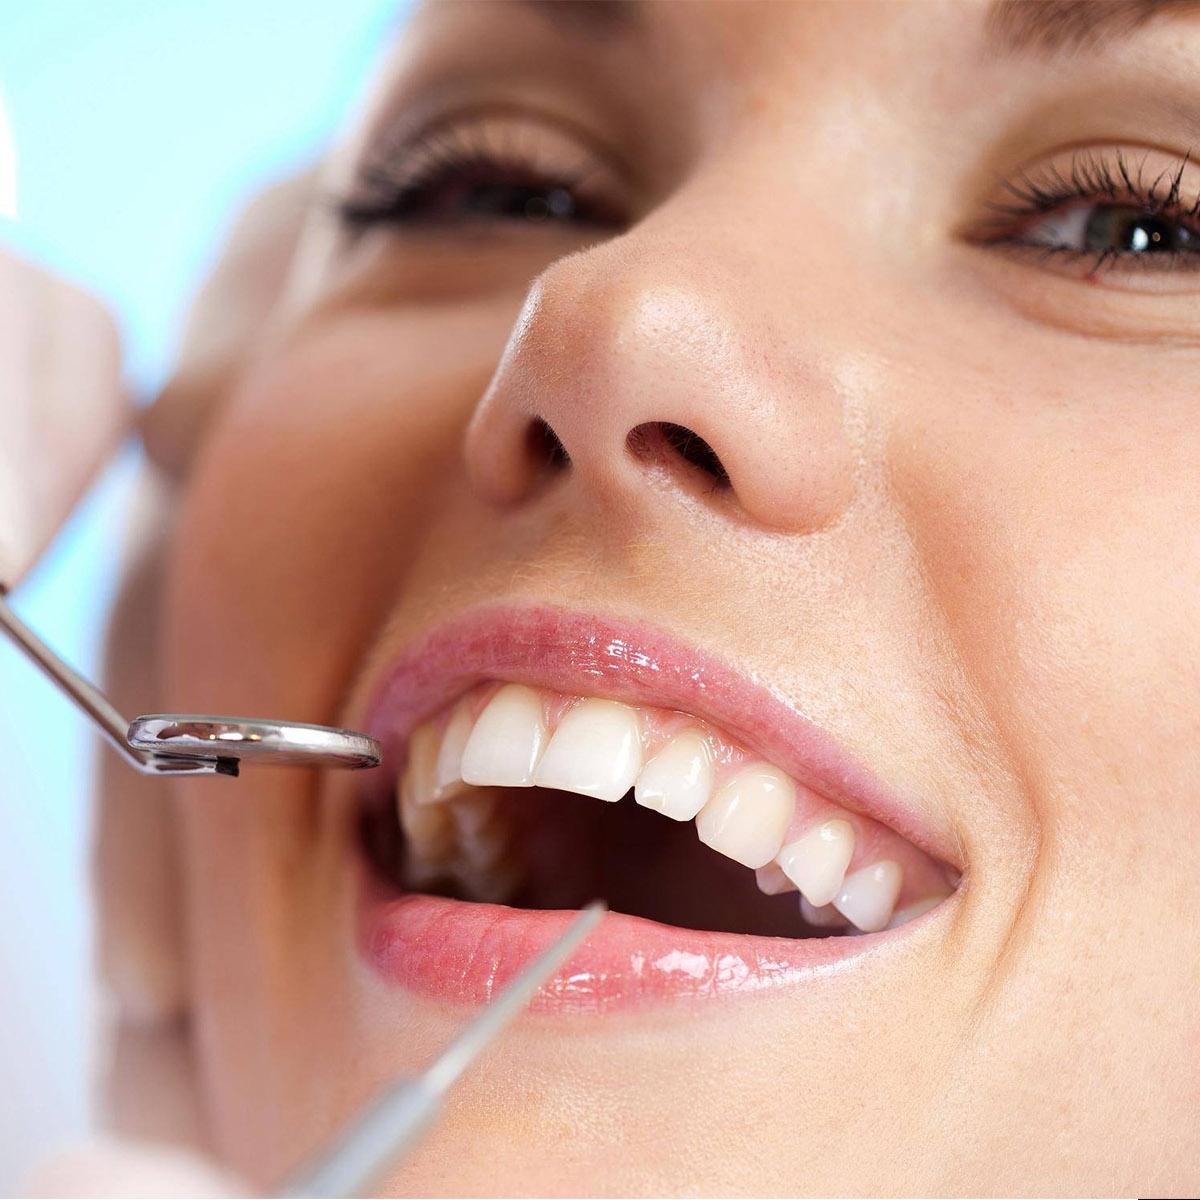 Oral surgery1.jpg